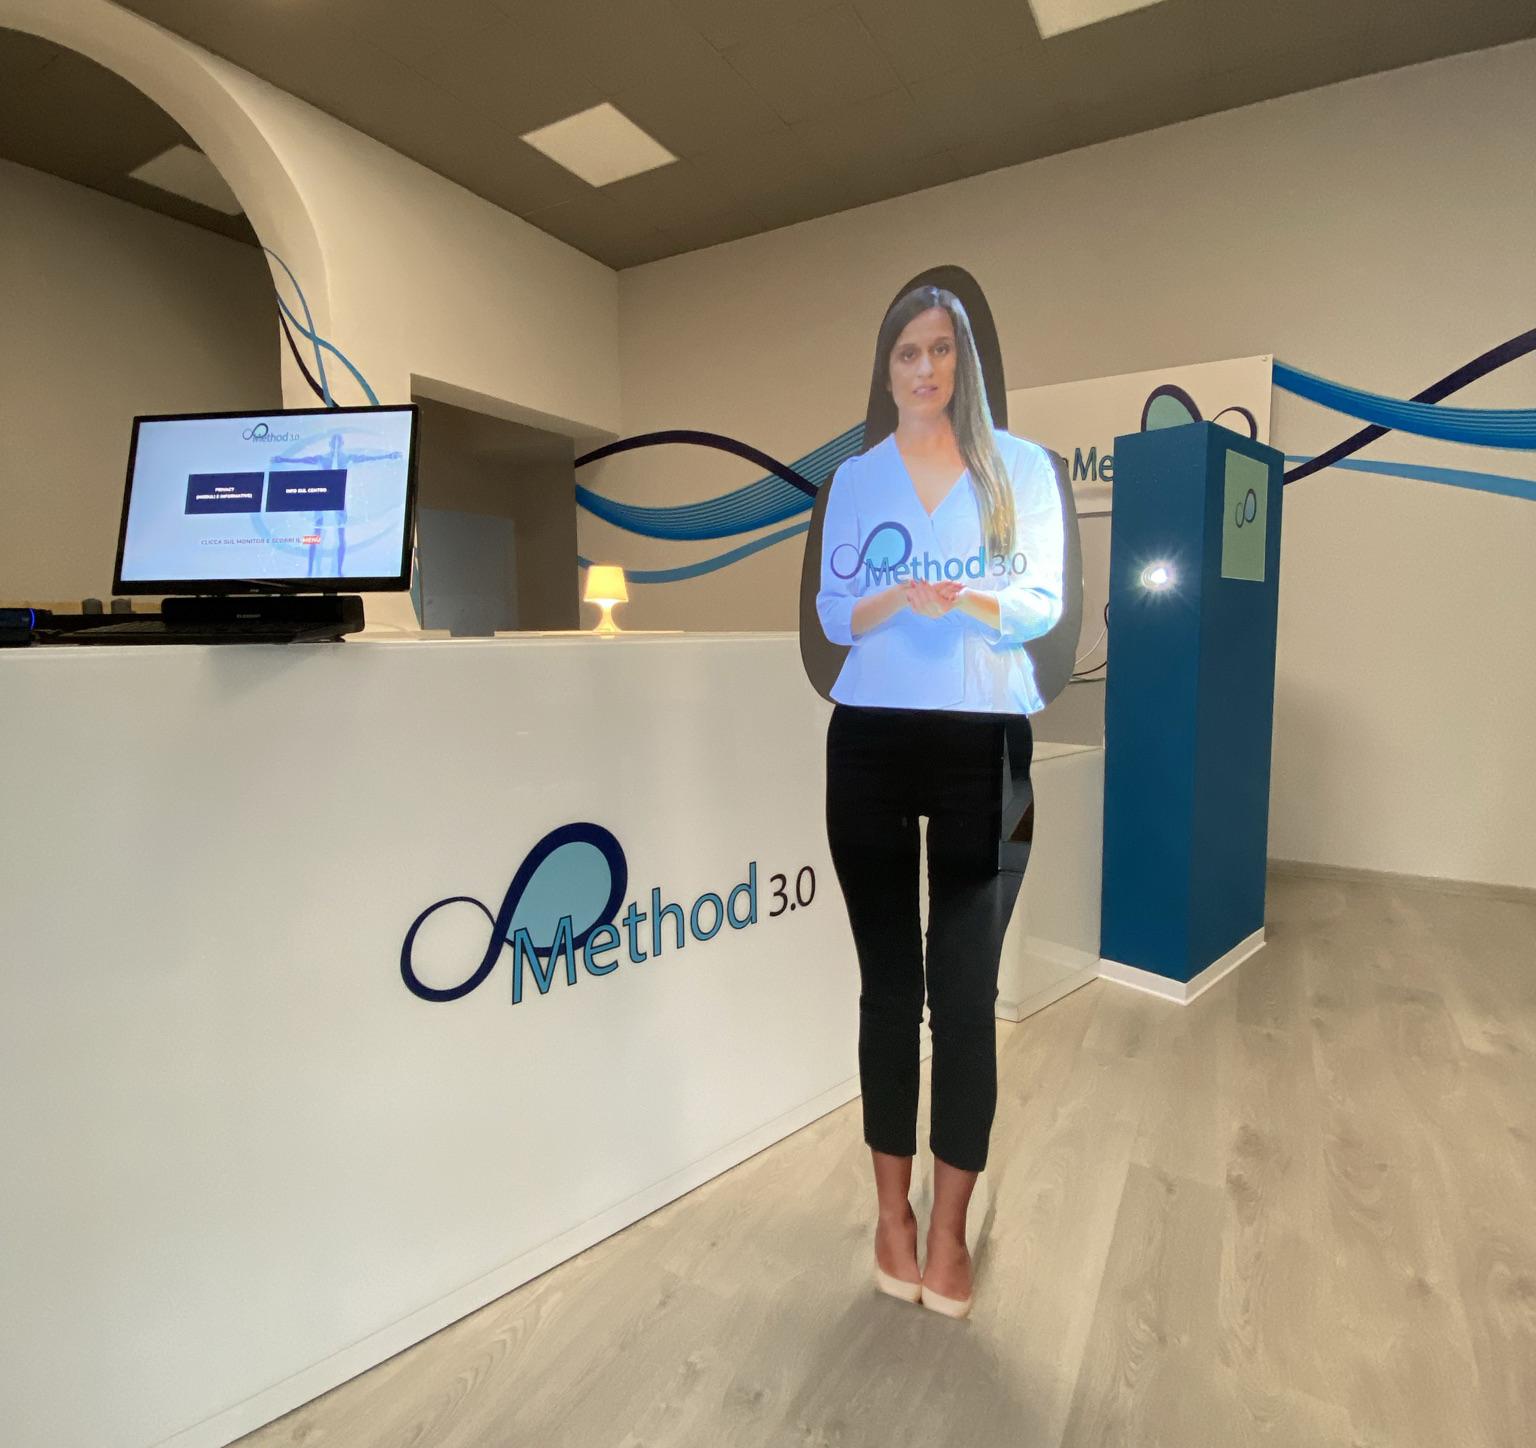 METHOD 3.0: la tecnologia virtuale approda in palestra